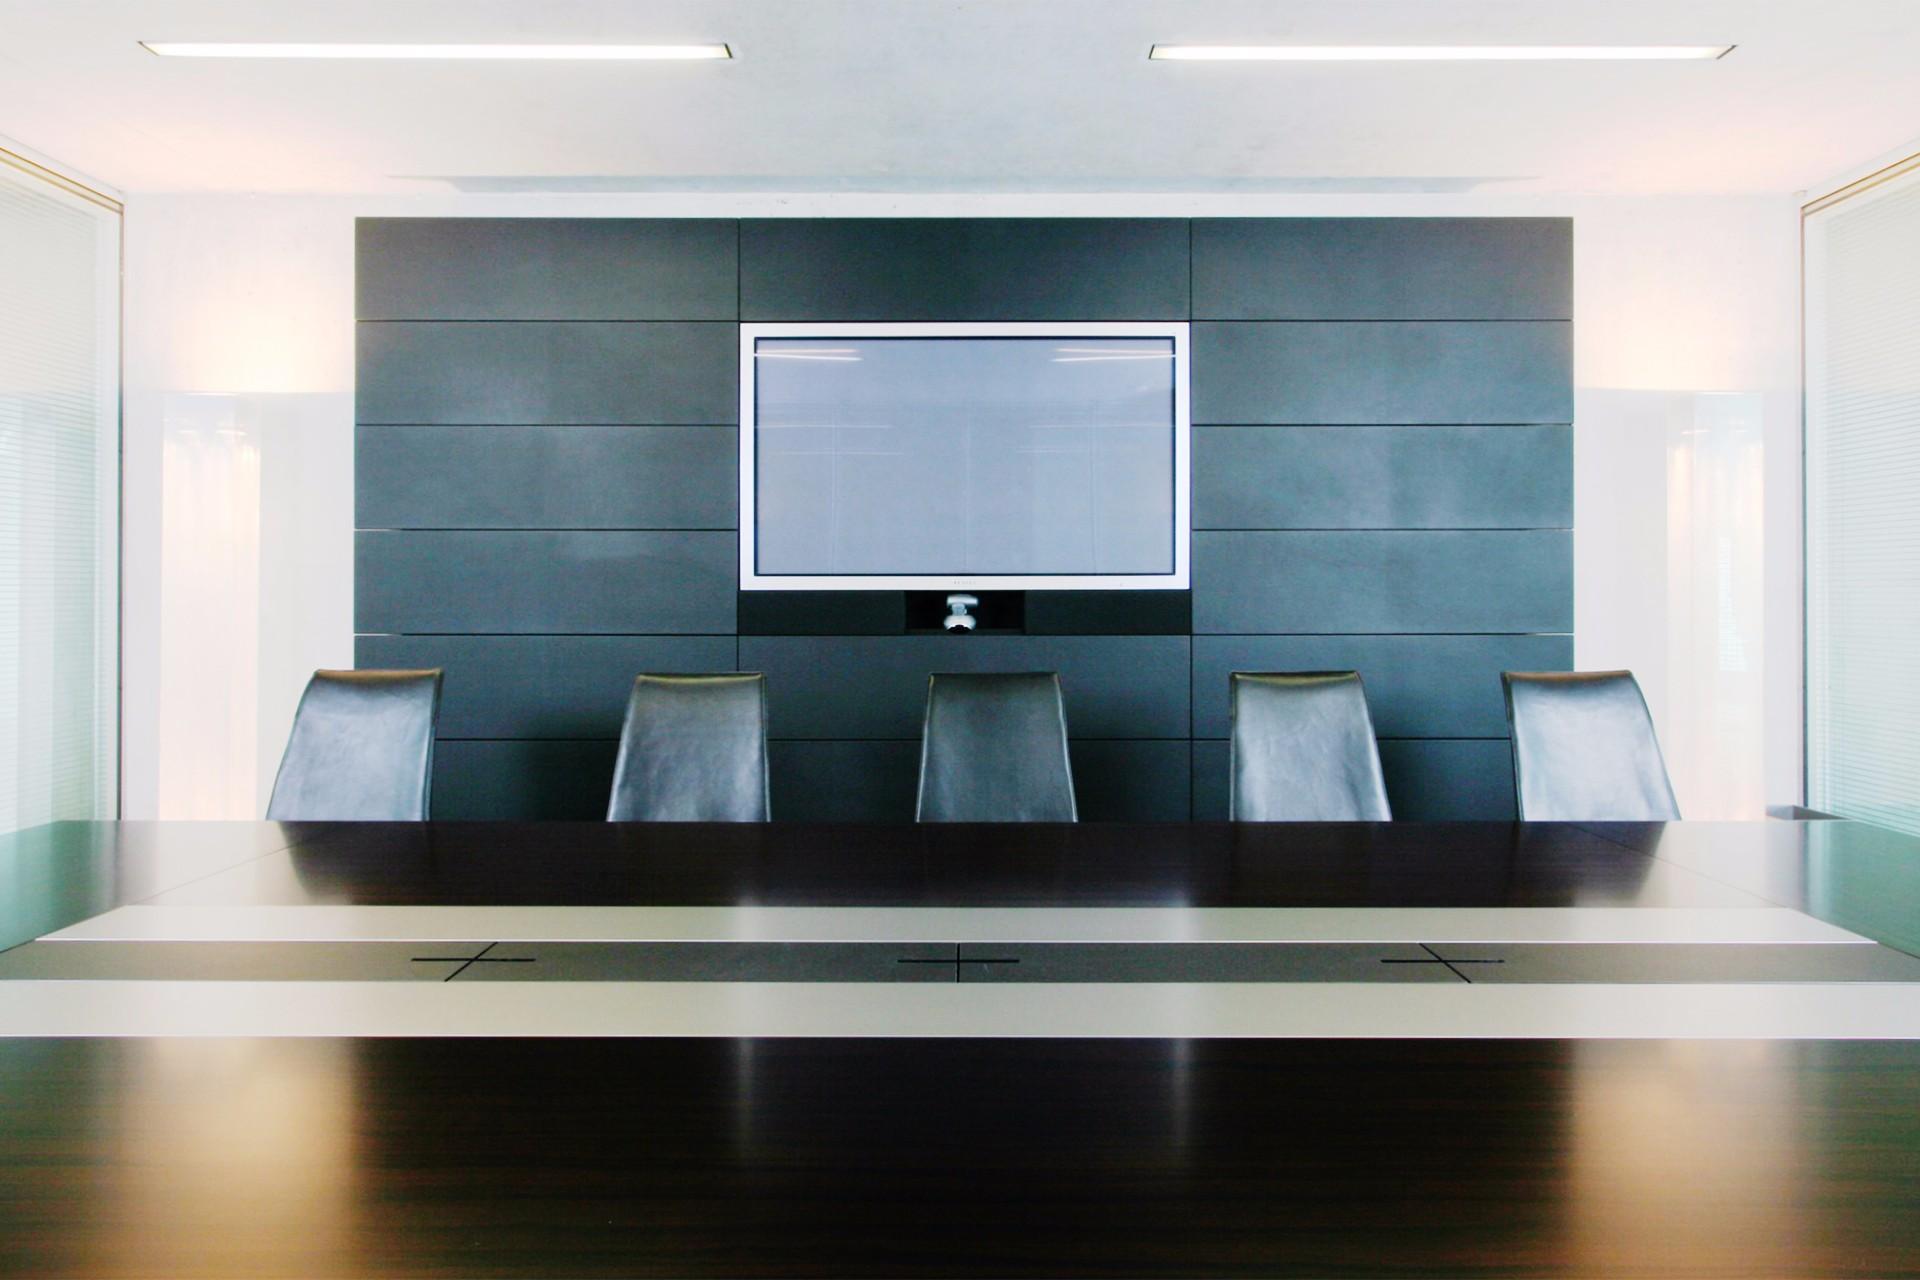 Konferenzraum Technik Lederwand Thöny Design